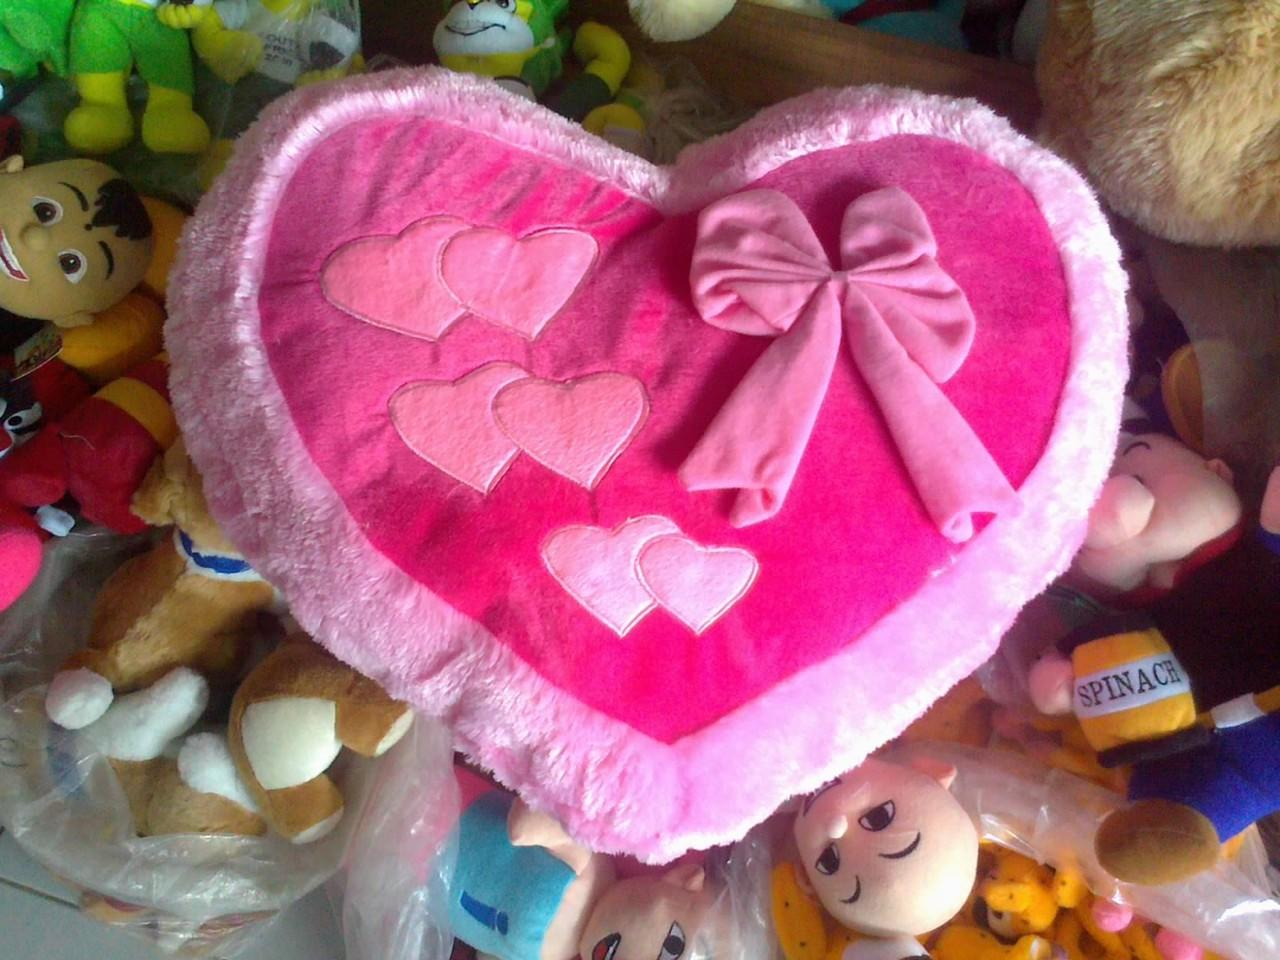 Boneka Murah kualitas teratas harga kaki lima berminat hubungi (08999483381)